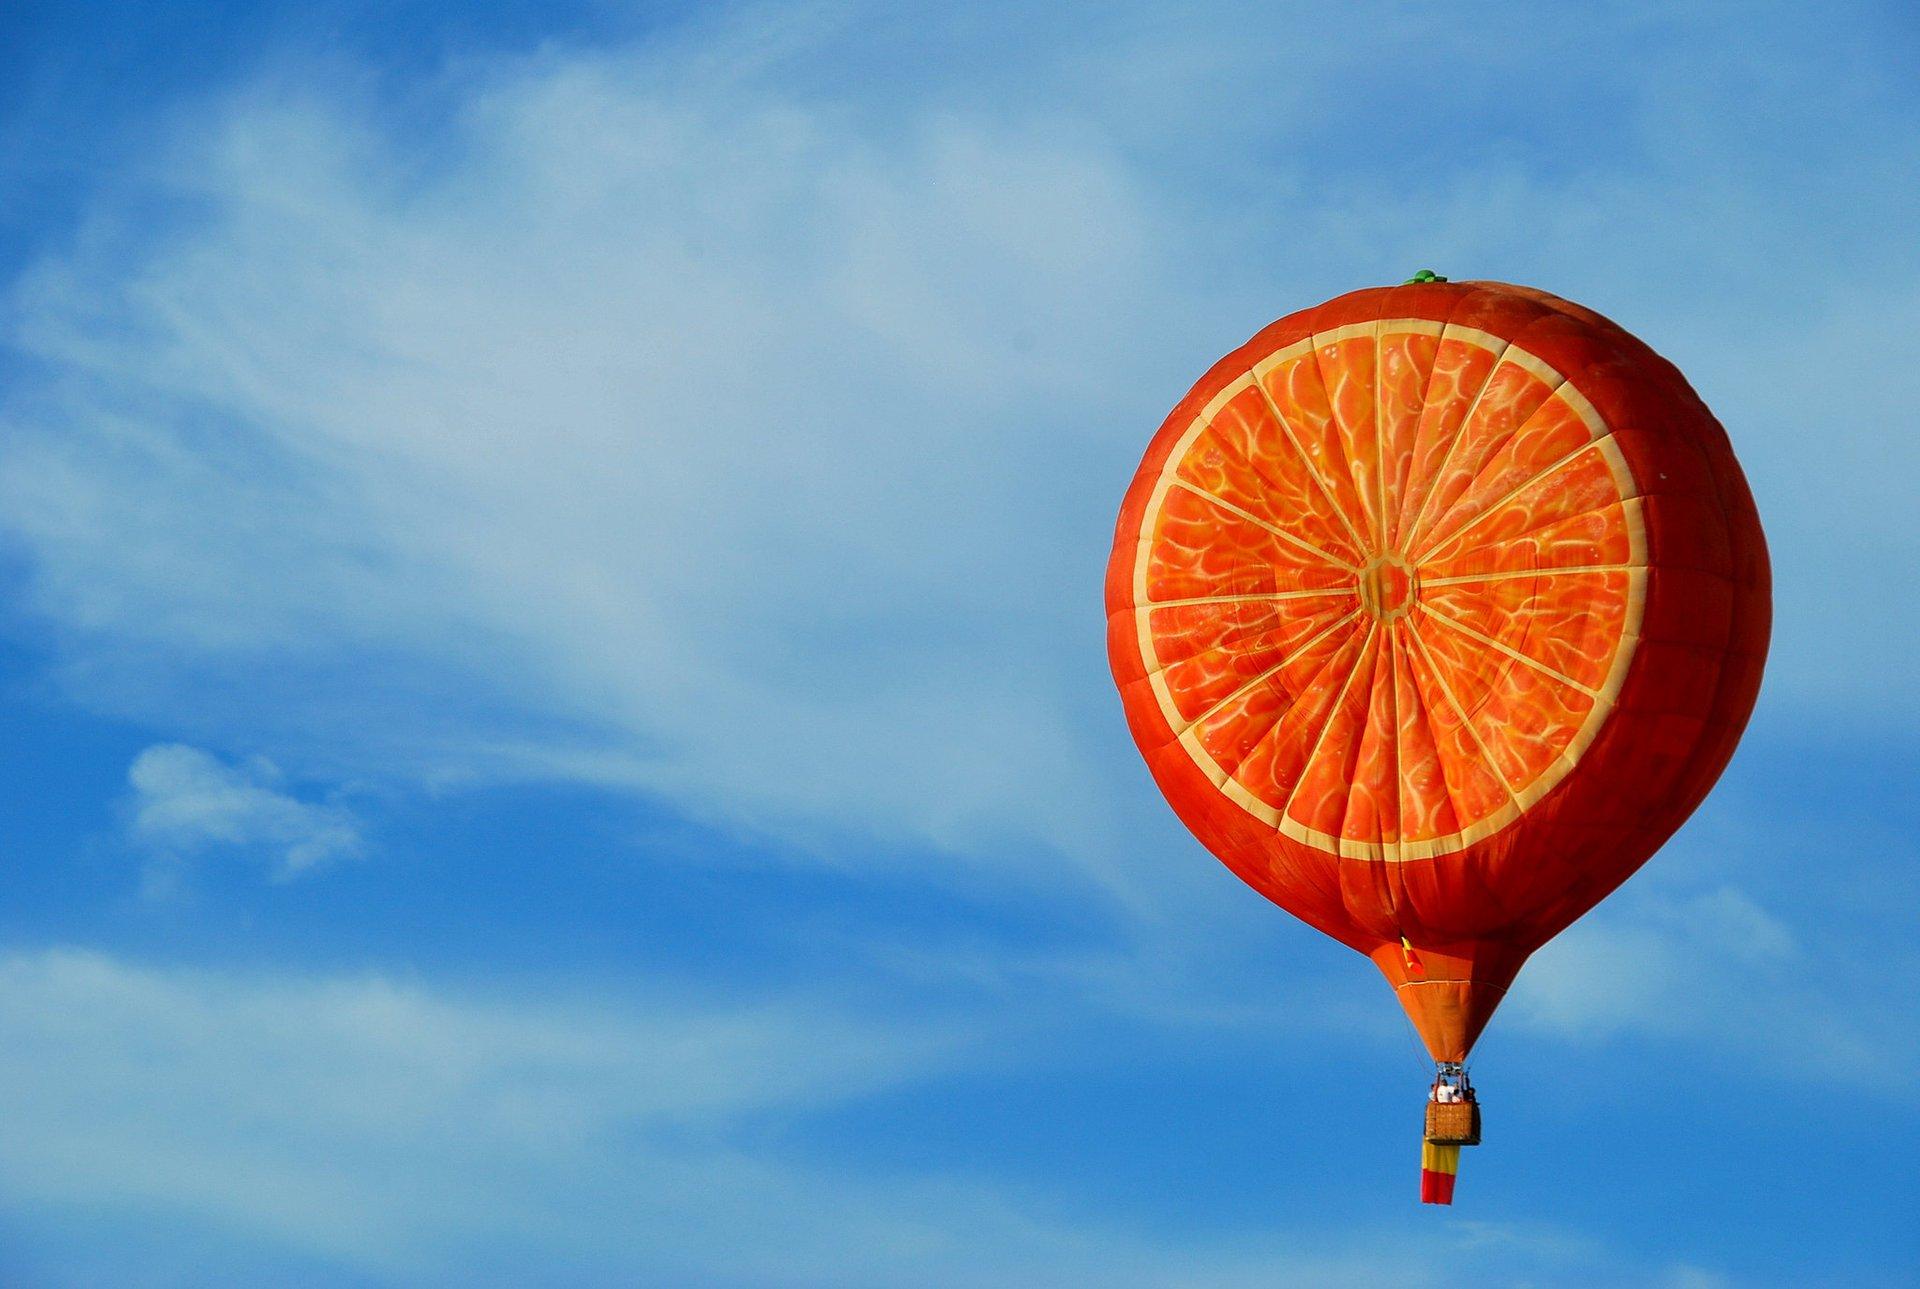 Putrajaya International Hot Air Balloon Fiesta in Kuala Lumpur 2020 - Best Time